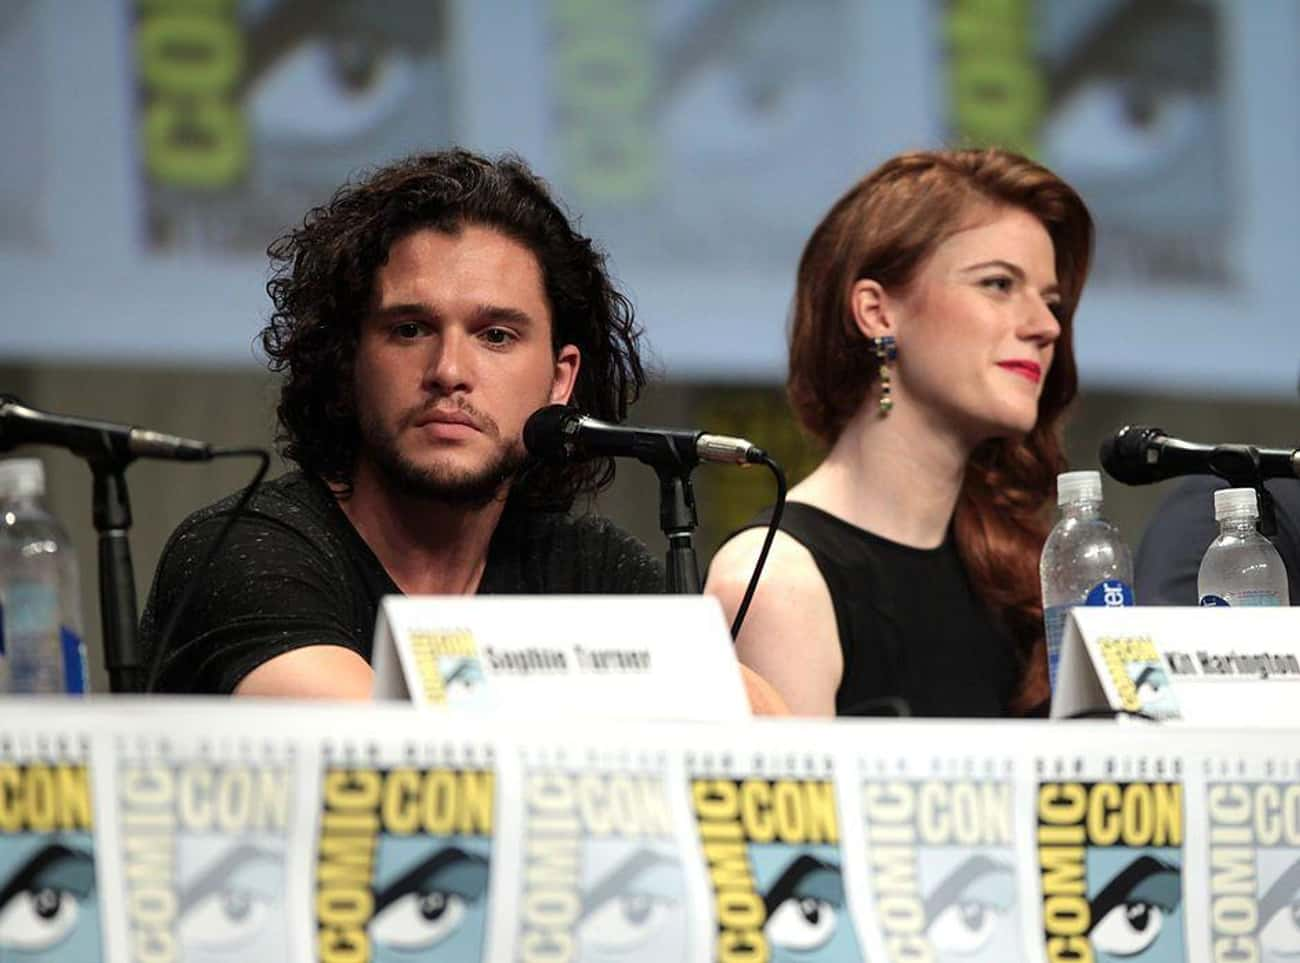 Jon Snow & Ygritte - Game of Thrones